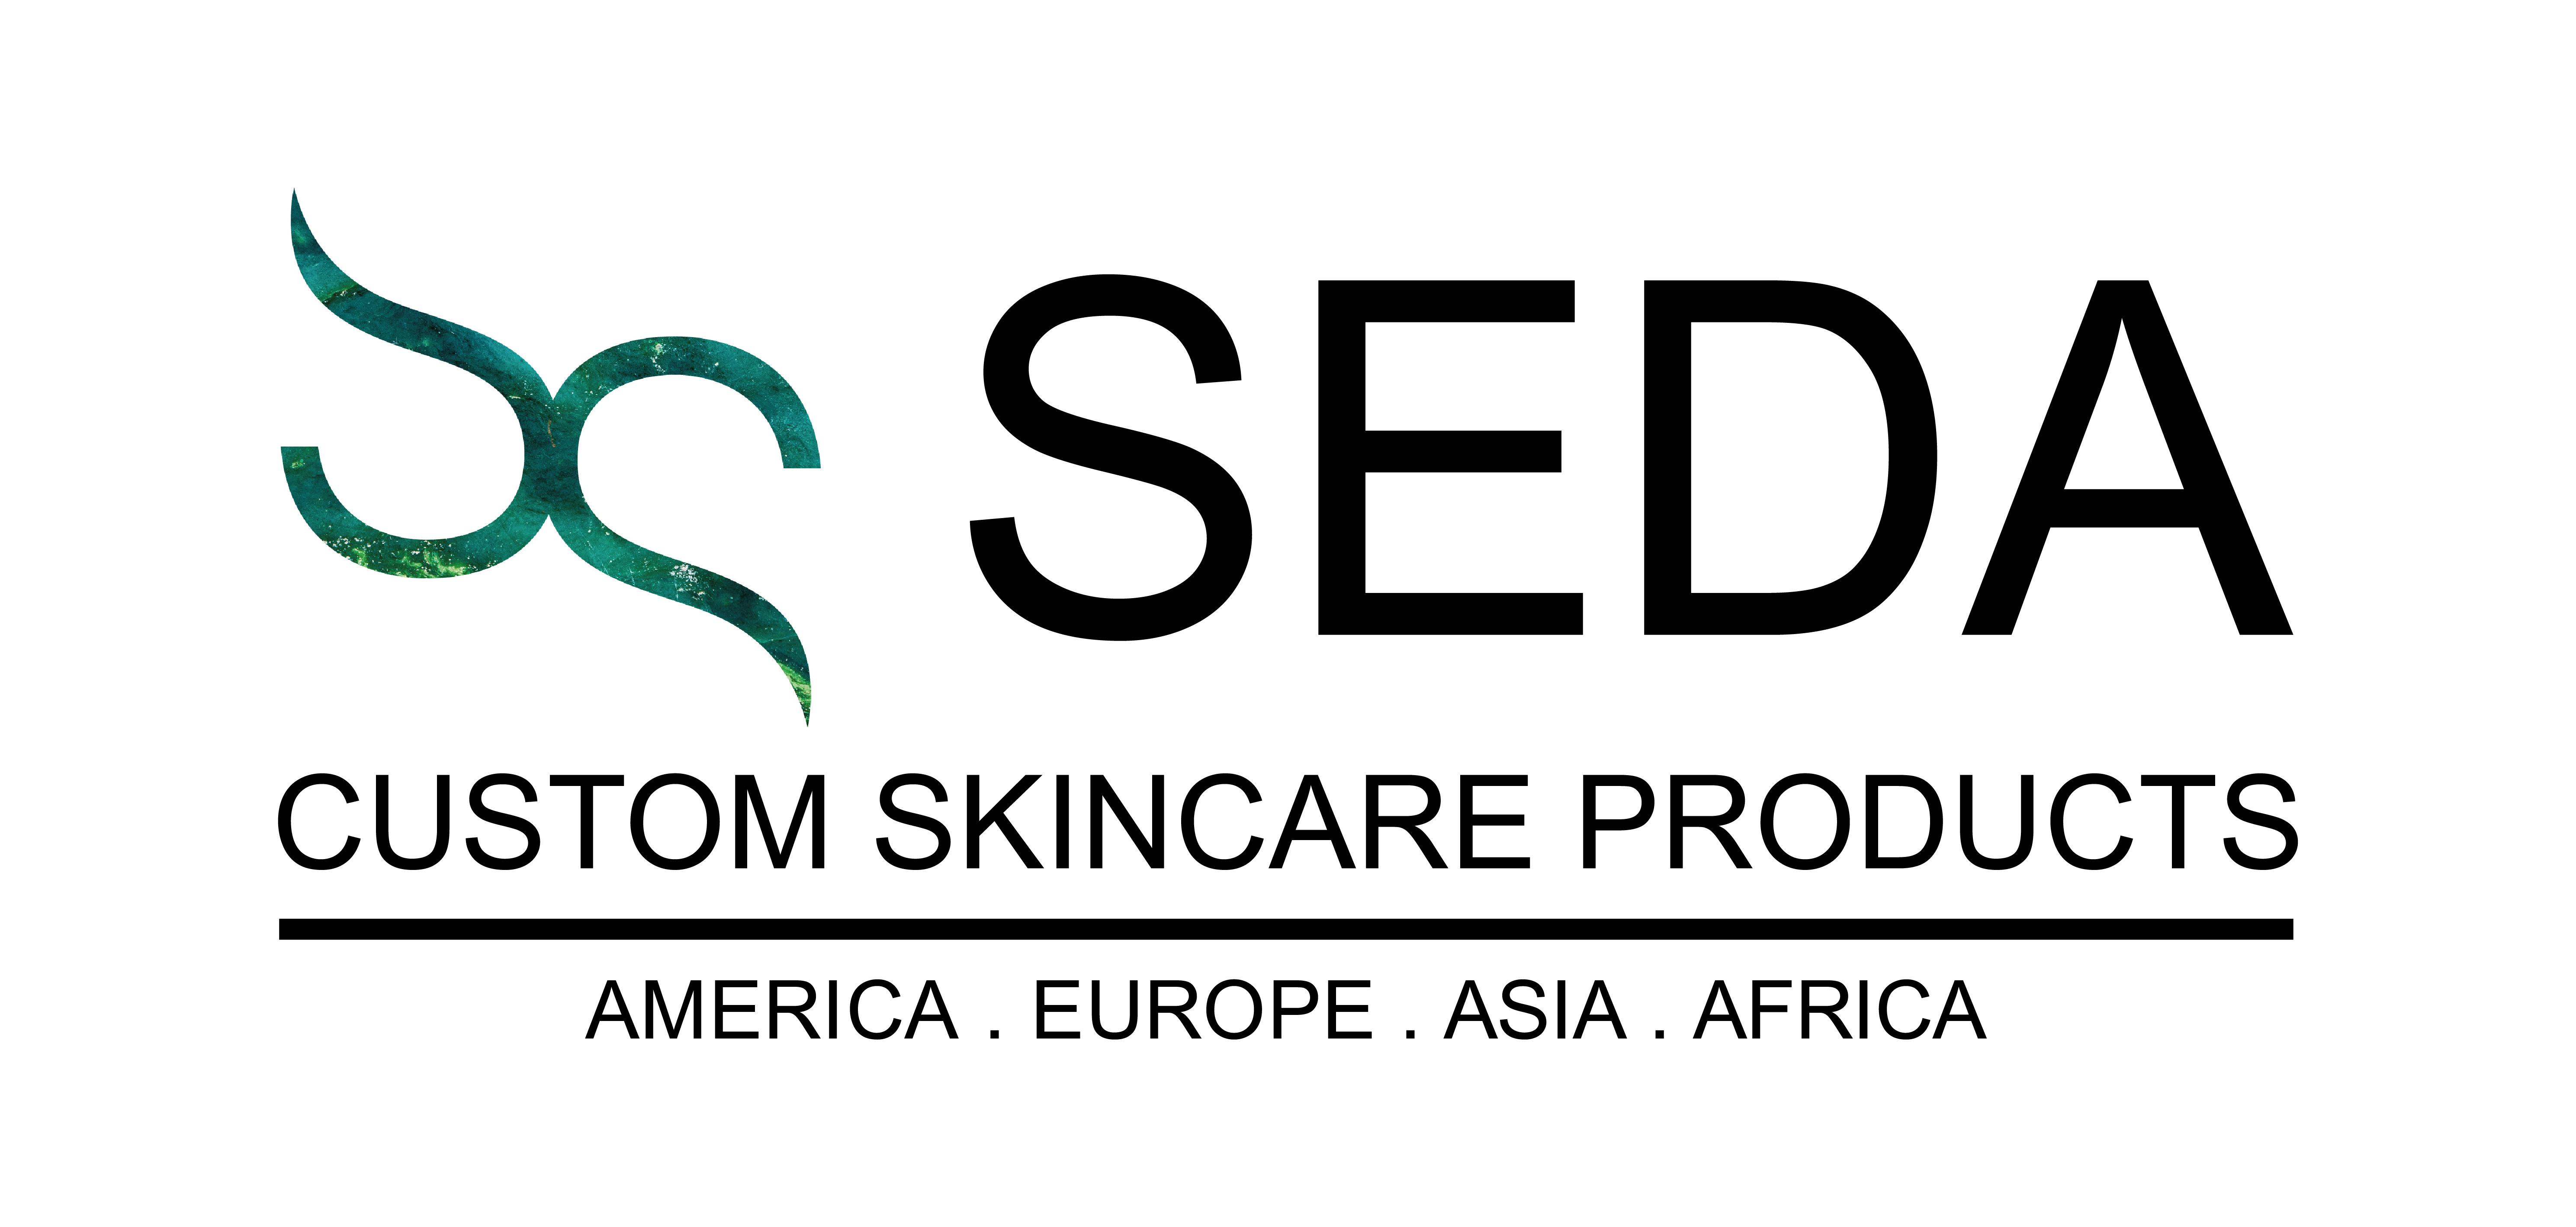 Seda Custom Skincare Products - La Cumbre Plaza Store Opens - October 15th, 2020 title=